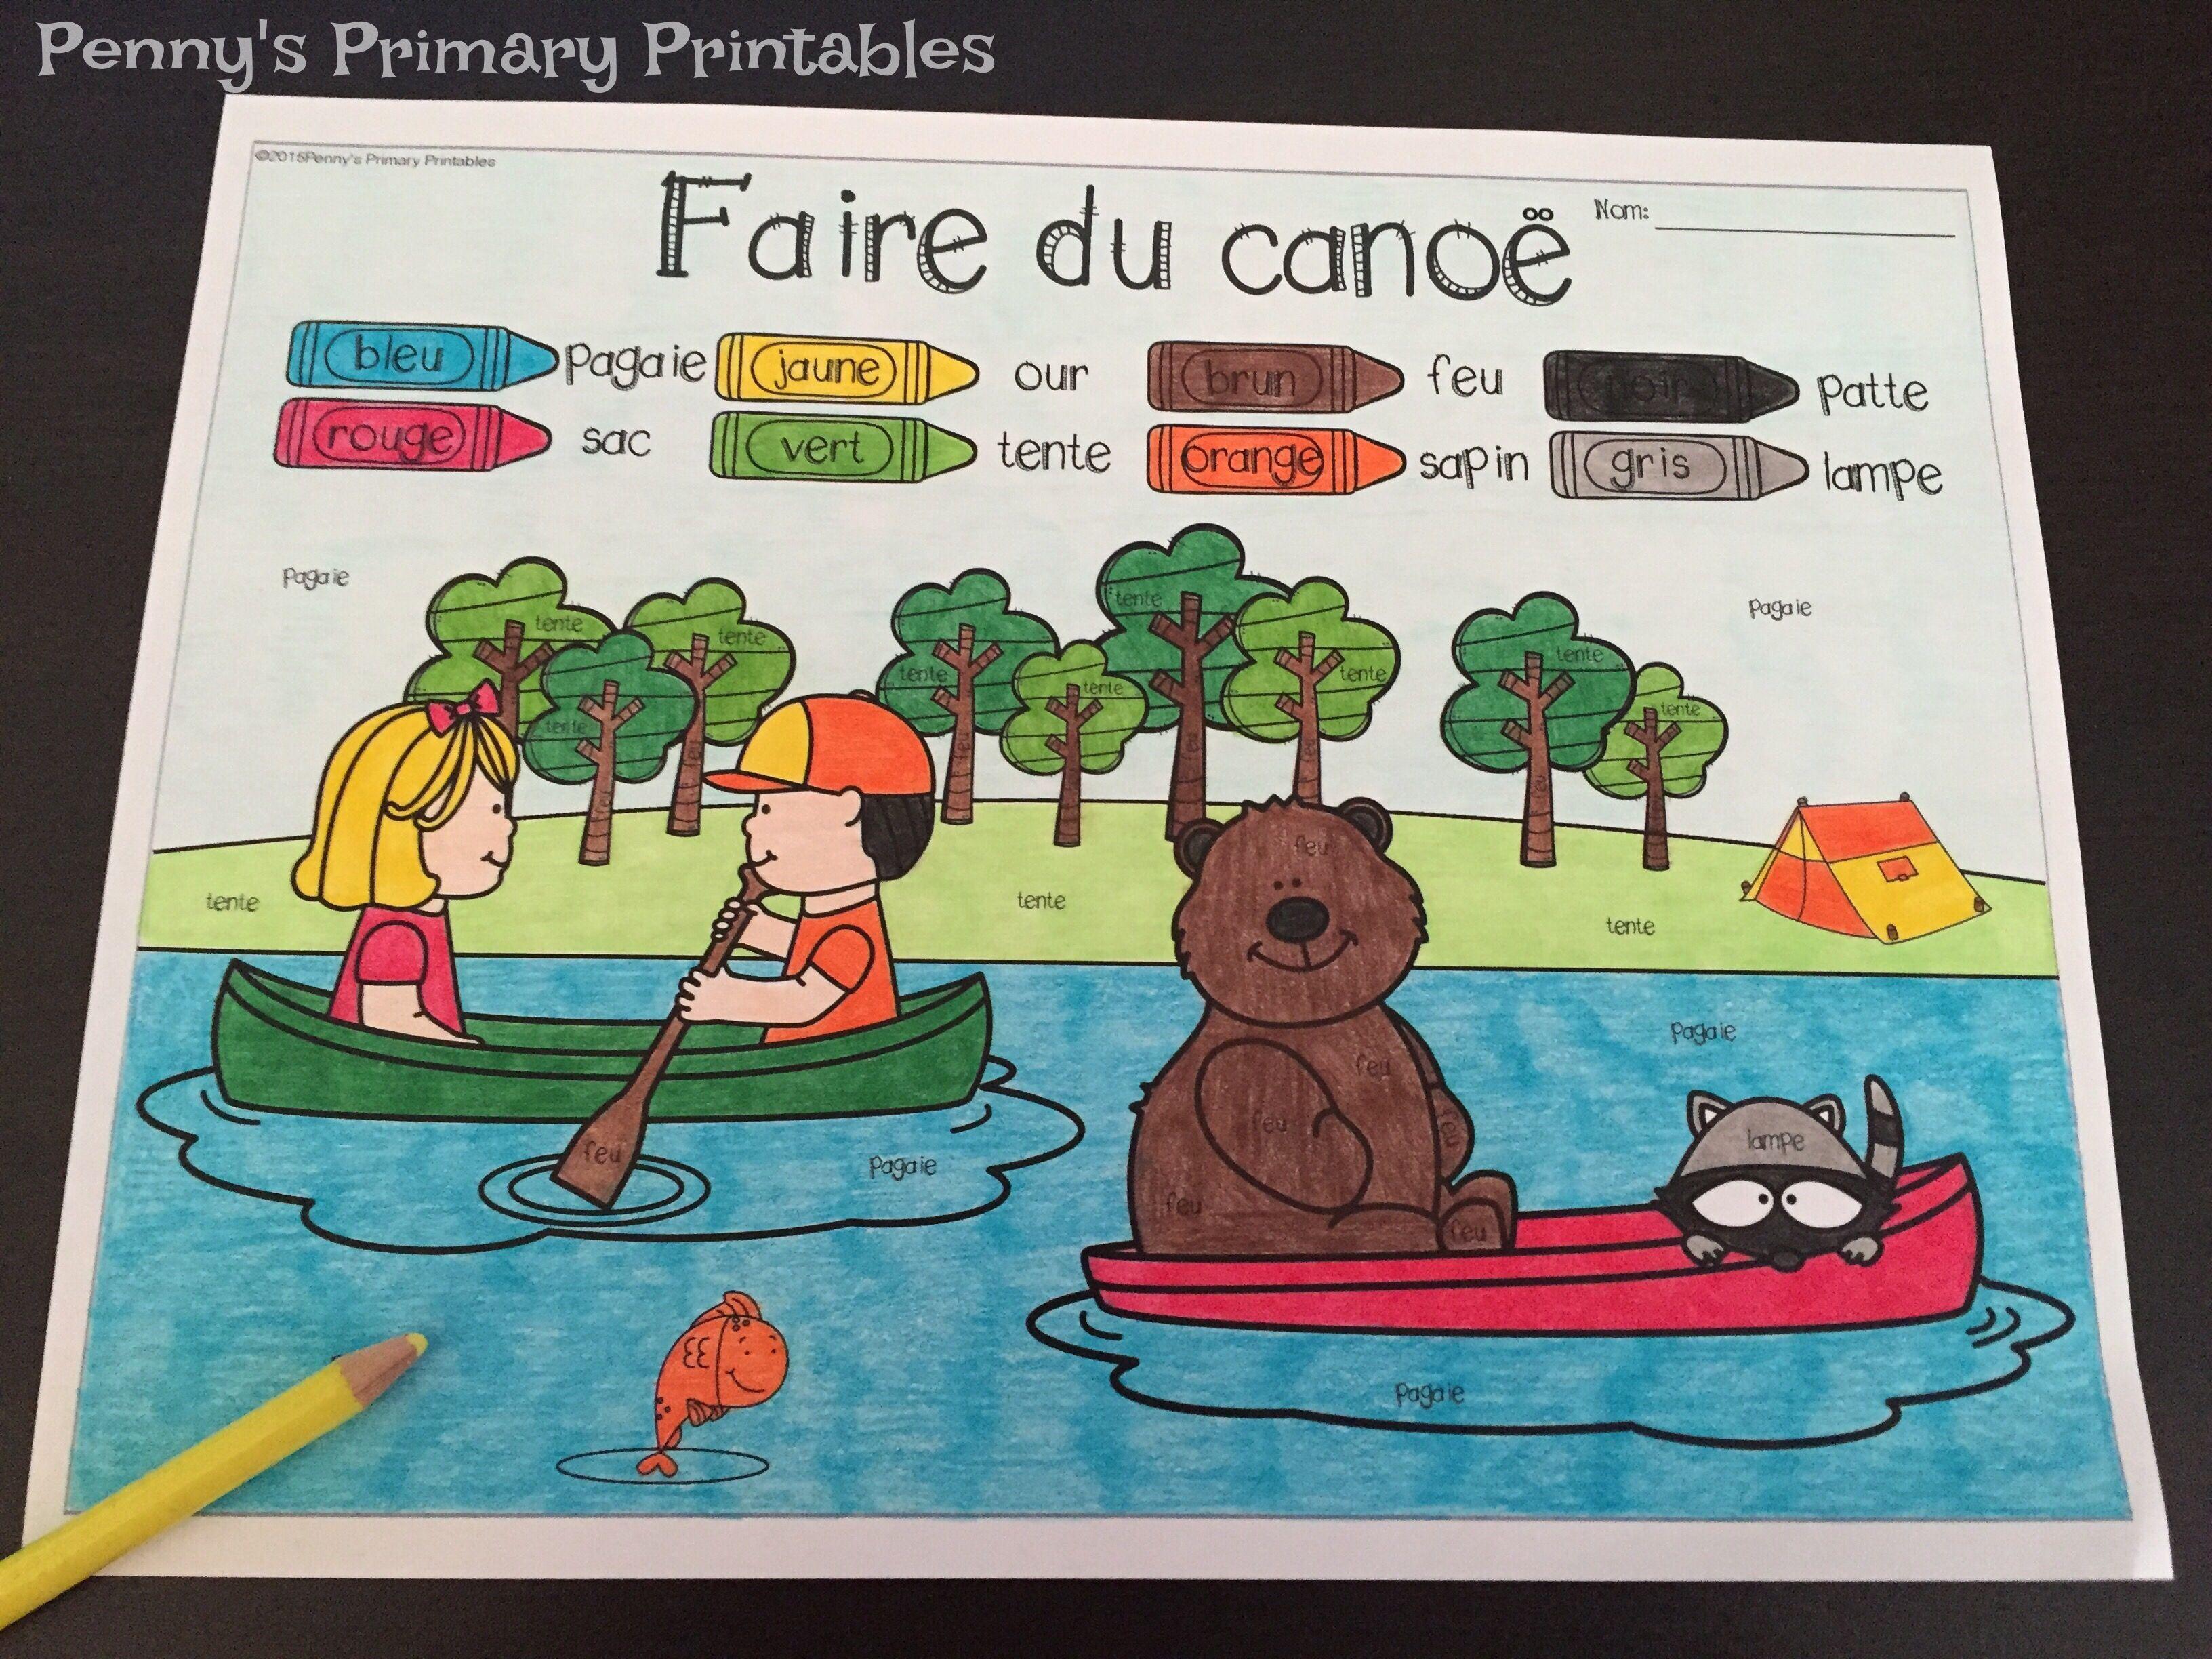 Any French vocabulary regarding camping?